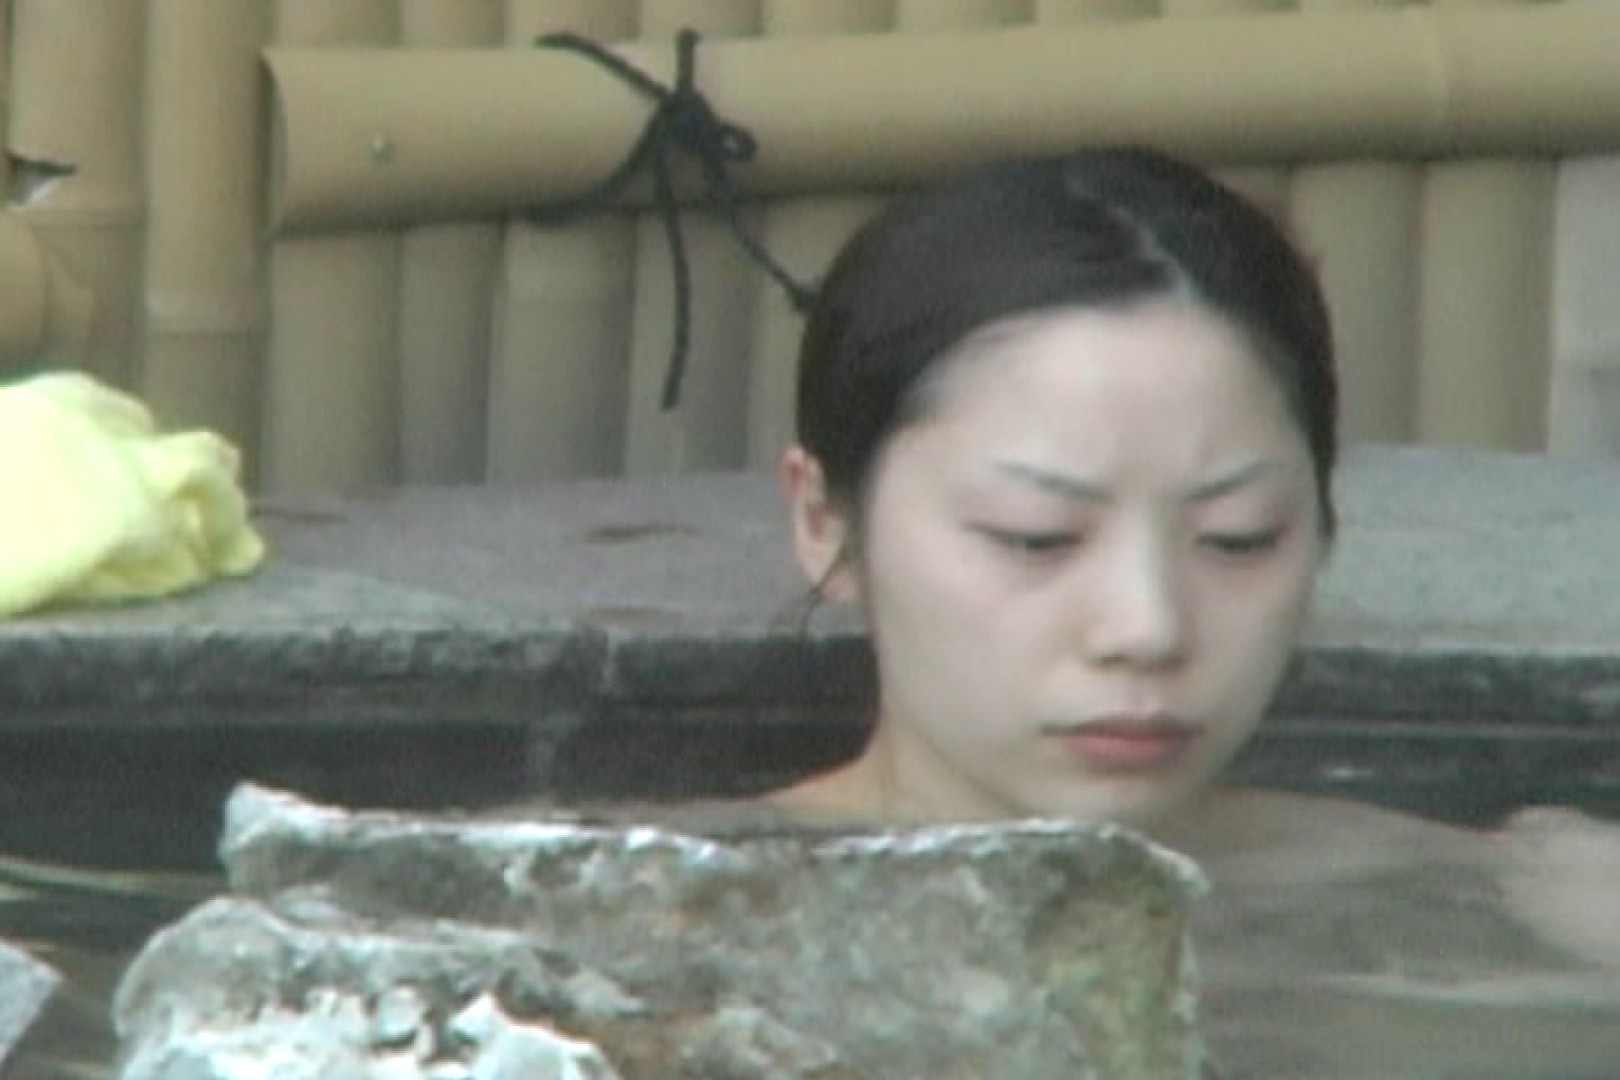 Aquaな露天風呂Vol.596 OLセックス  77画像 30